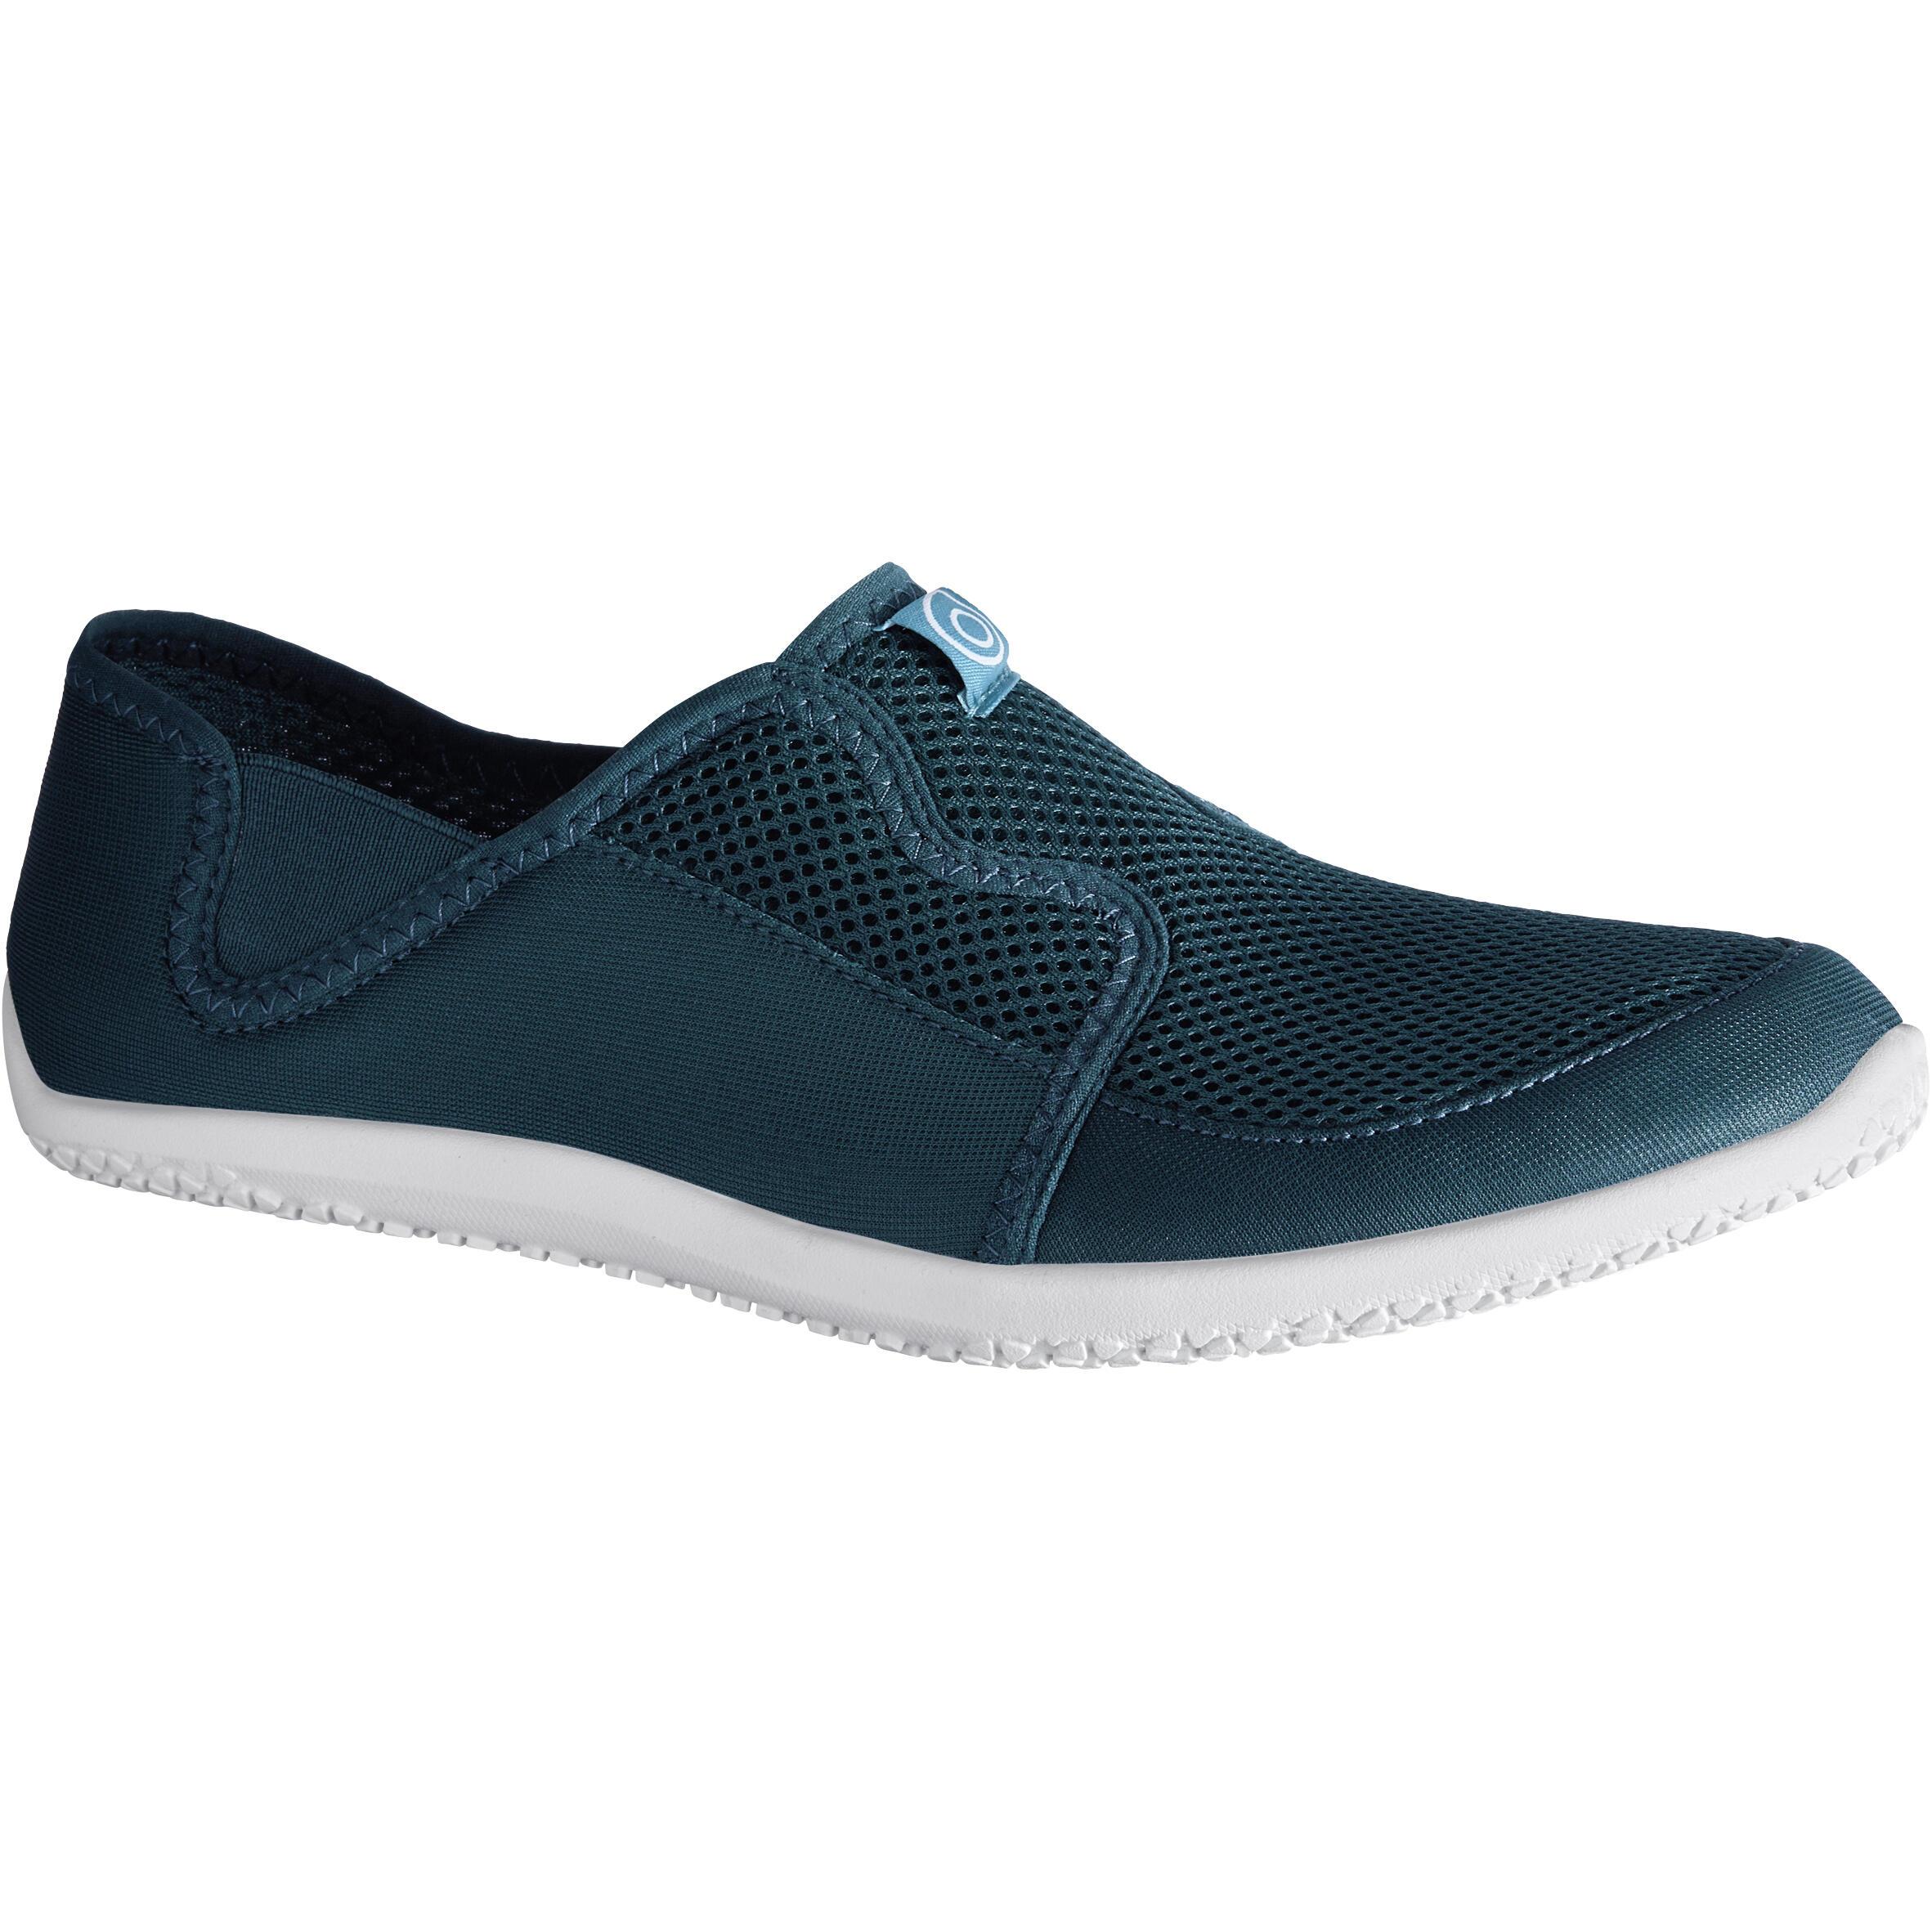 Aquaschuhe 120 Erwachsene dunkeltürkis | Schuhe > Badeschuhe | Blau - Türkis | Subea